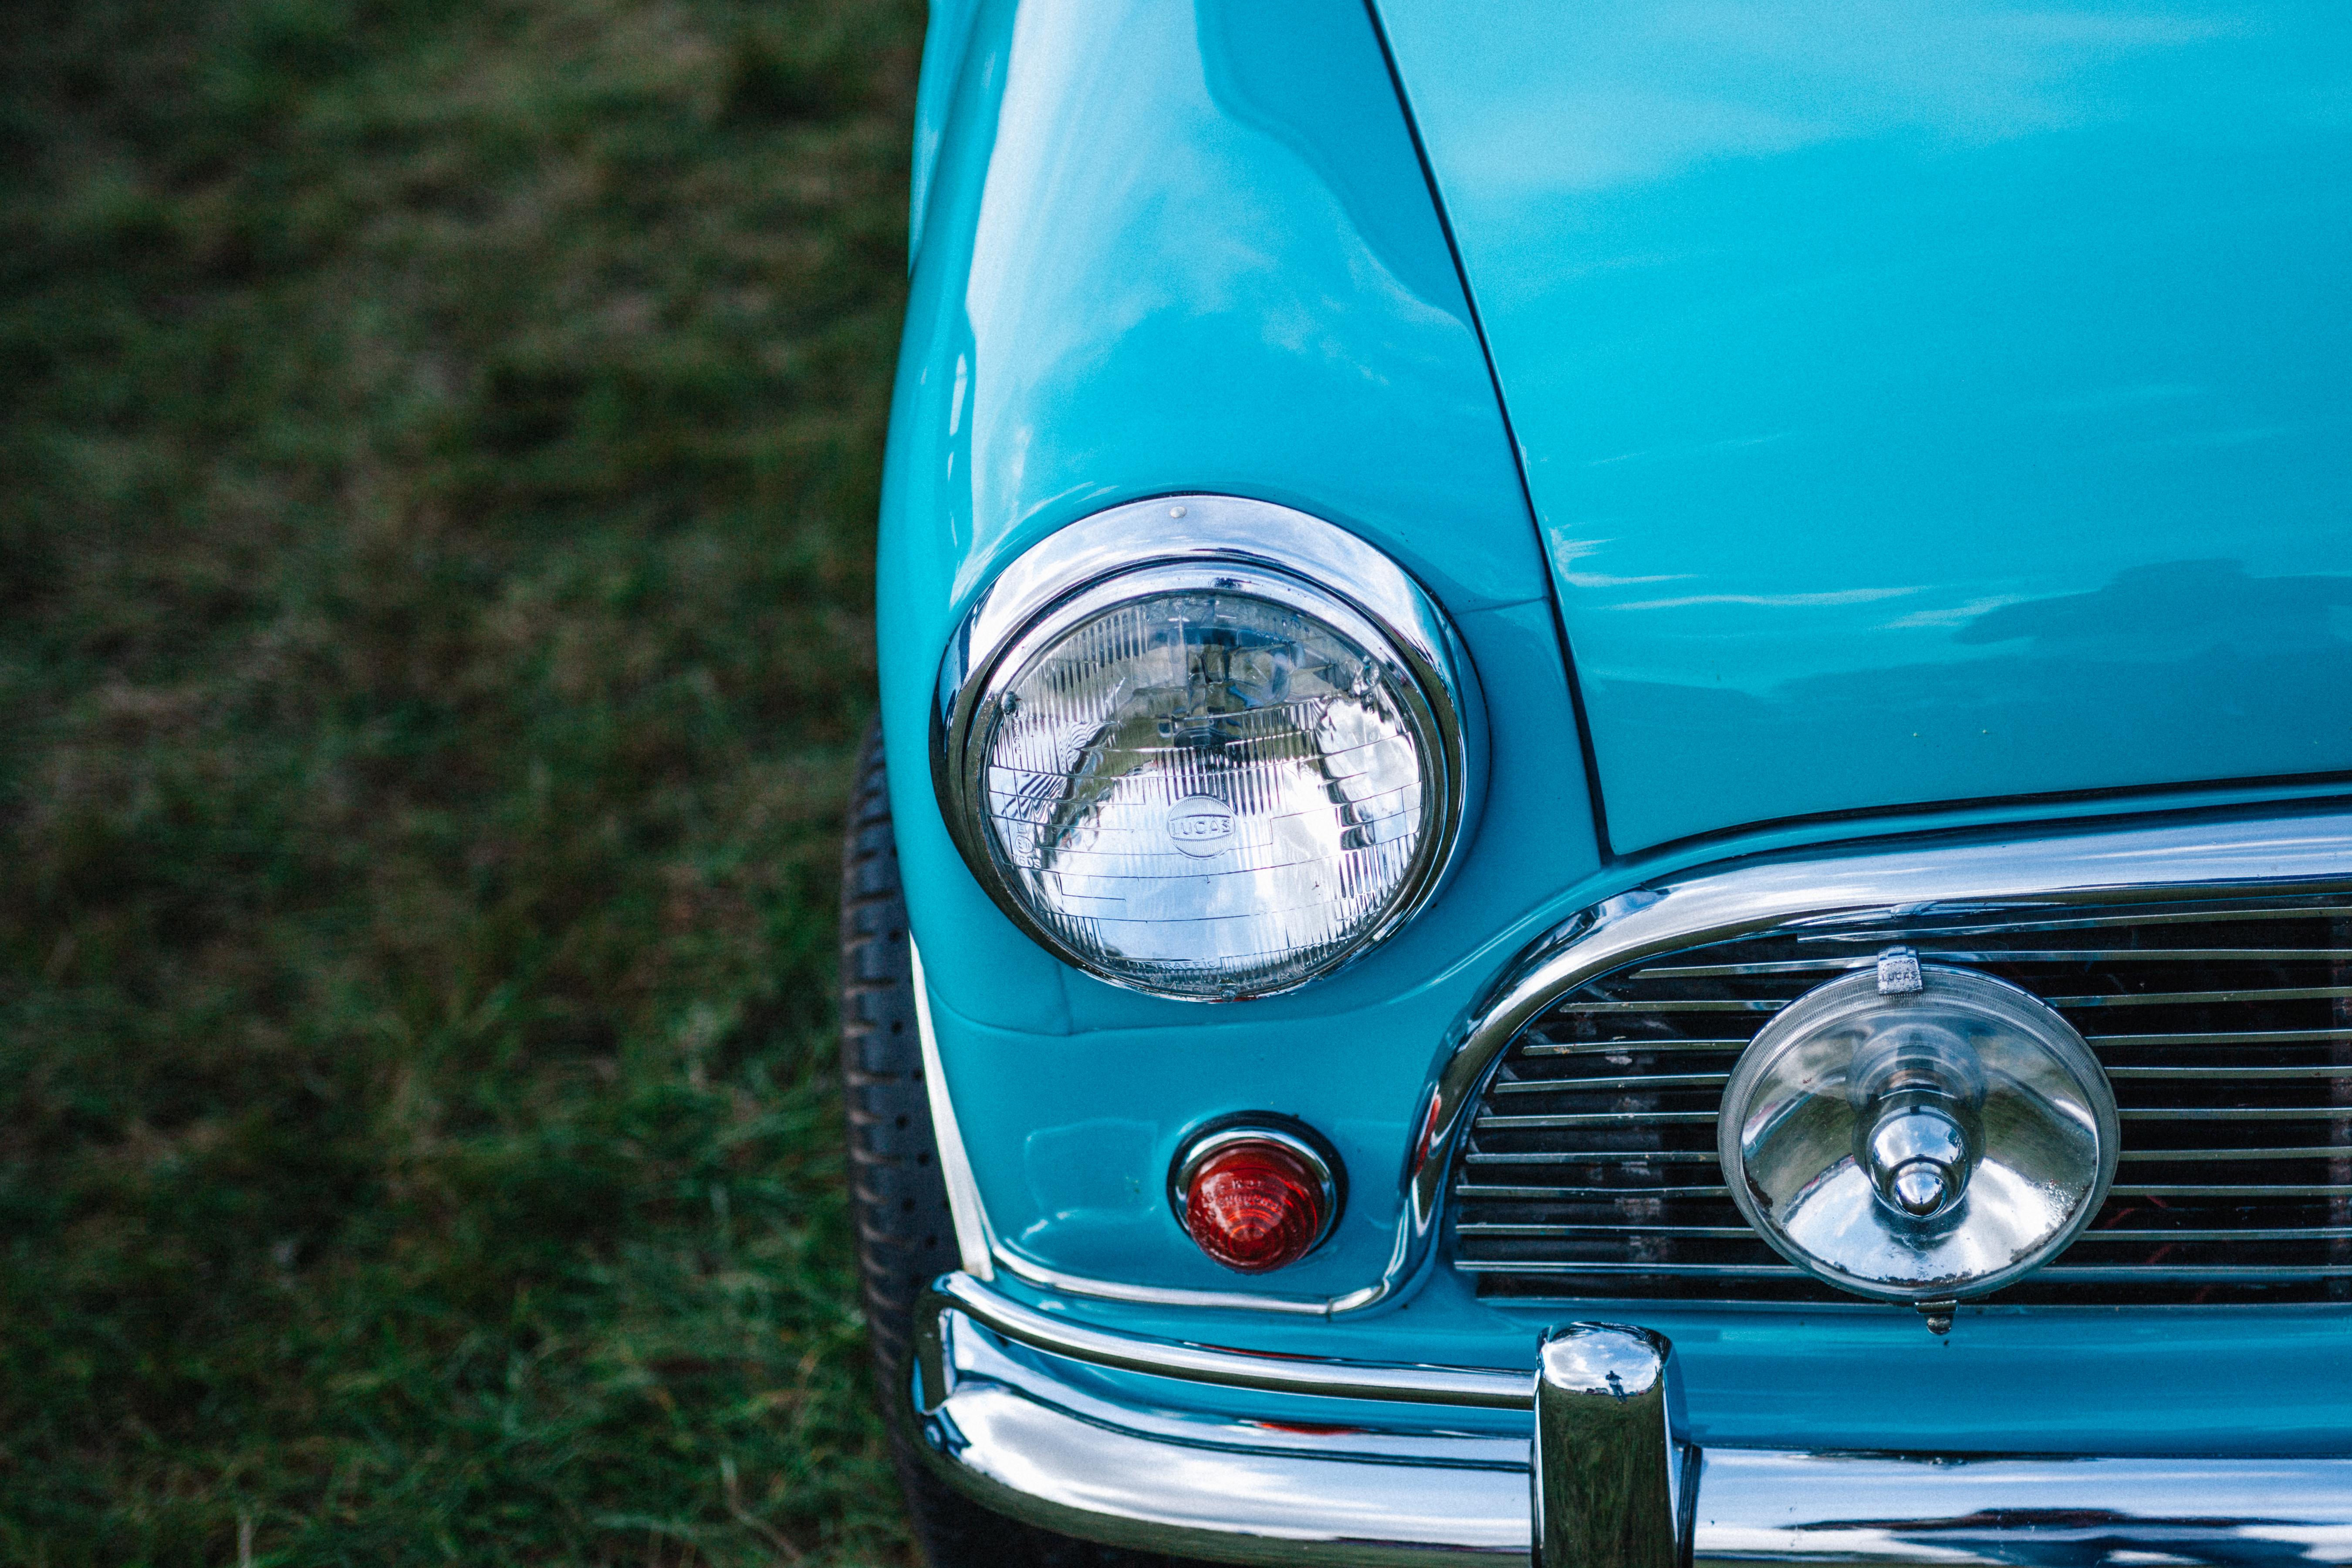 File Turquoise Classic Car Unsplash Jpg Wikimedia Commons